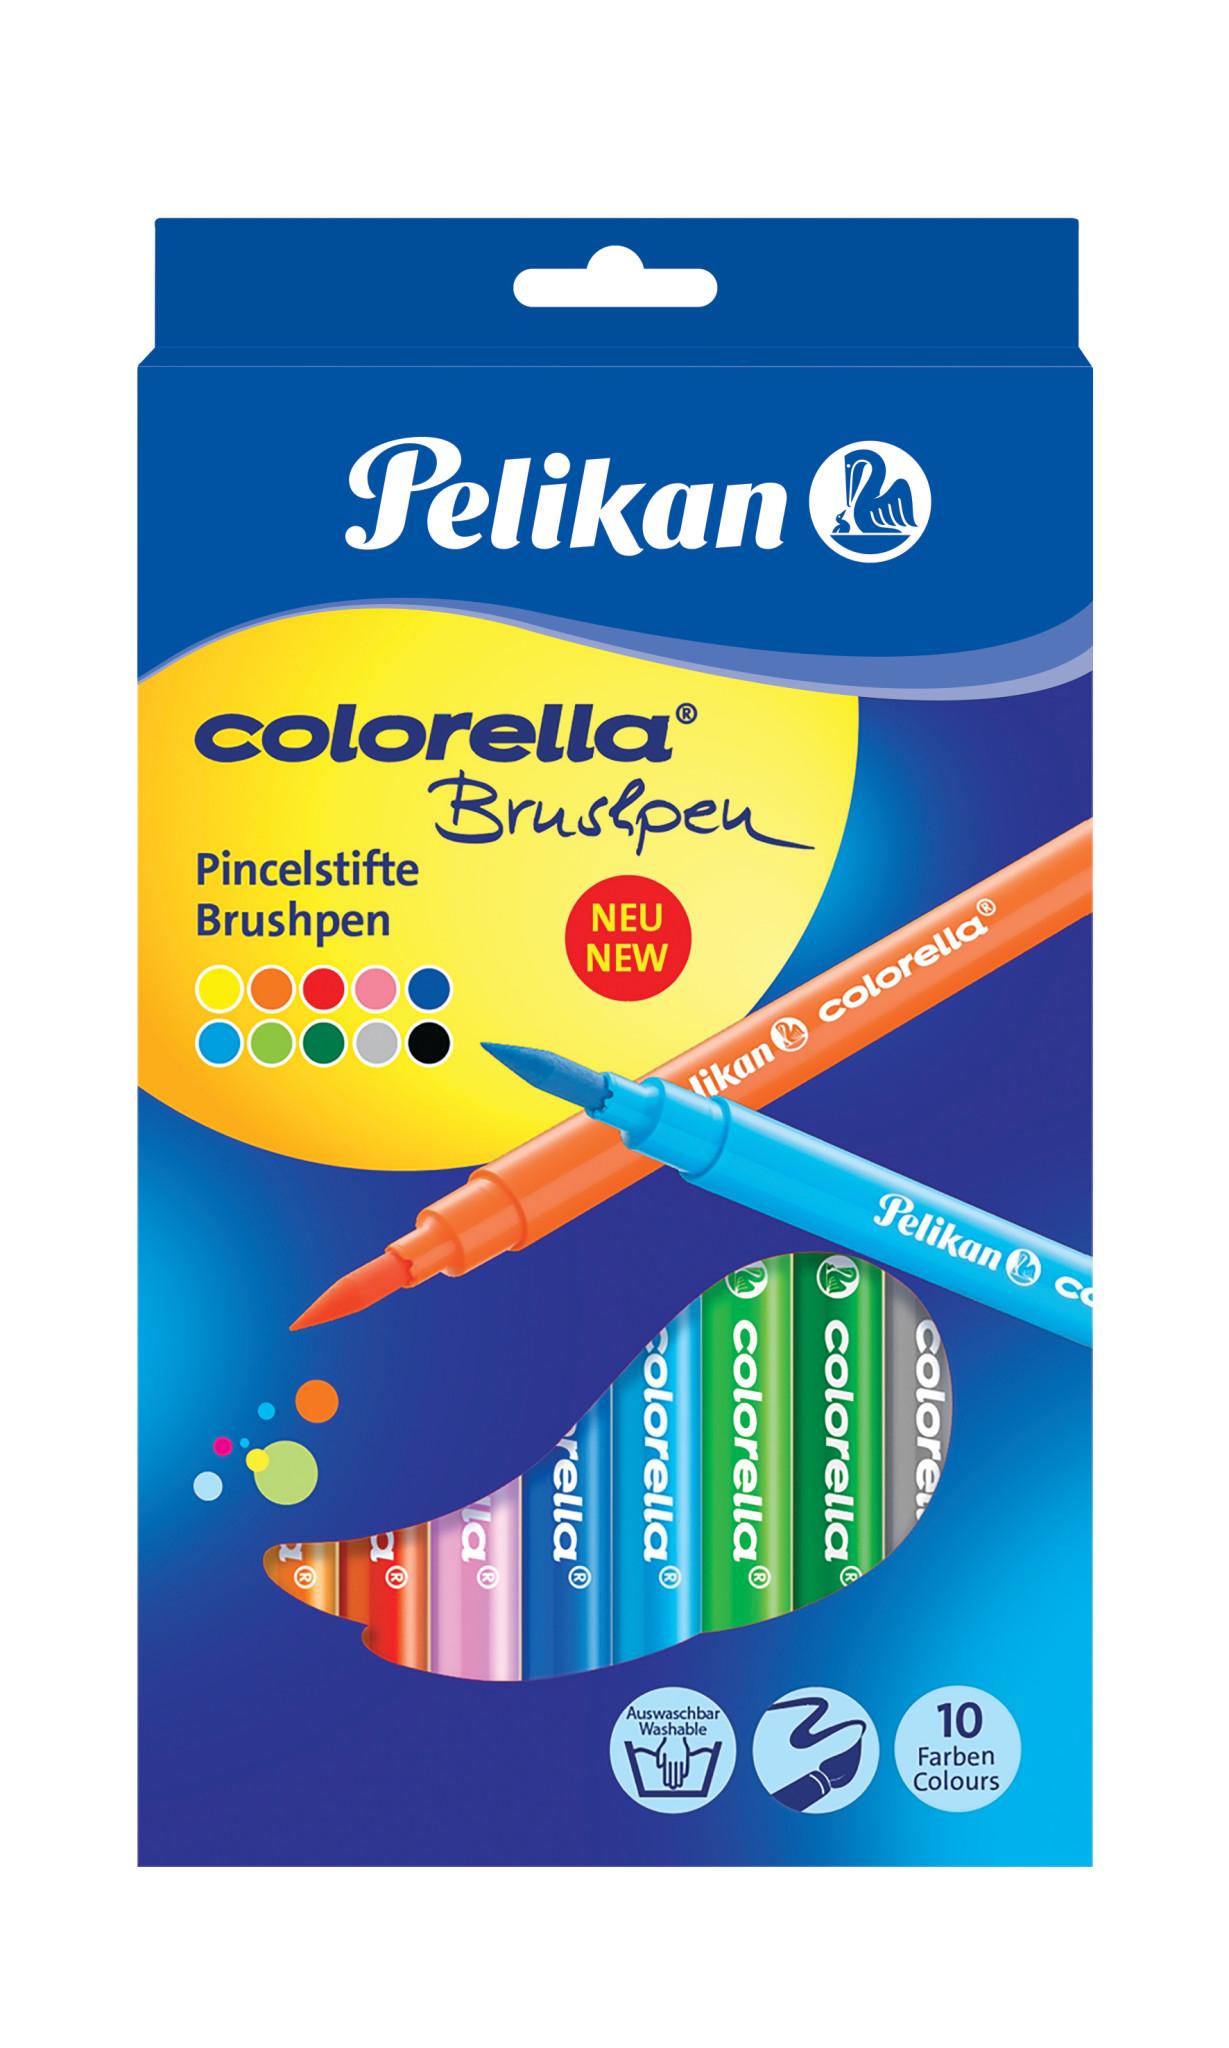 Pelikan Colorella Brushpen - Mehrfarbig - Rund - Ausstellungsbox - 10 Stück(e)